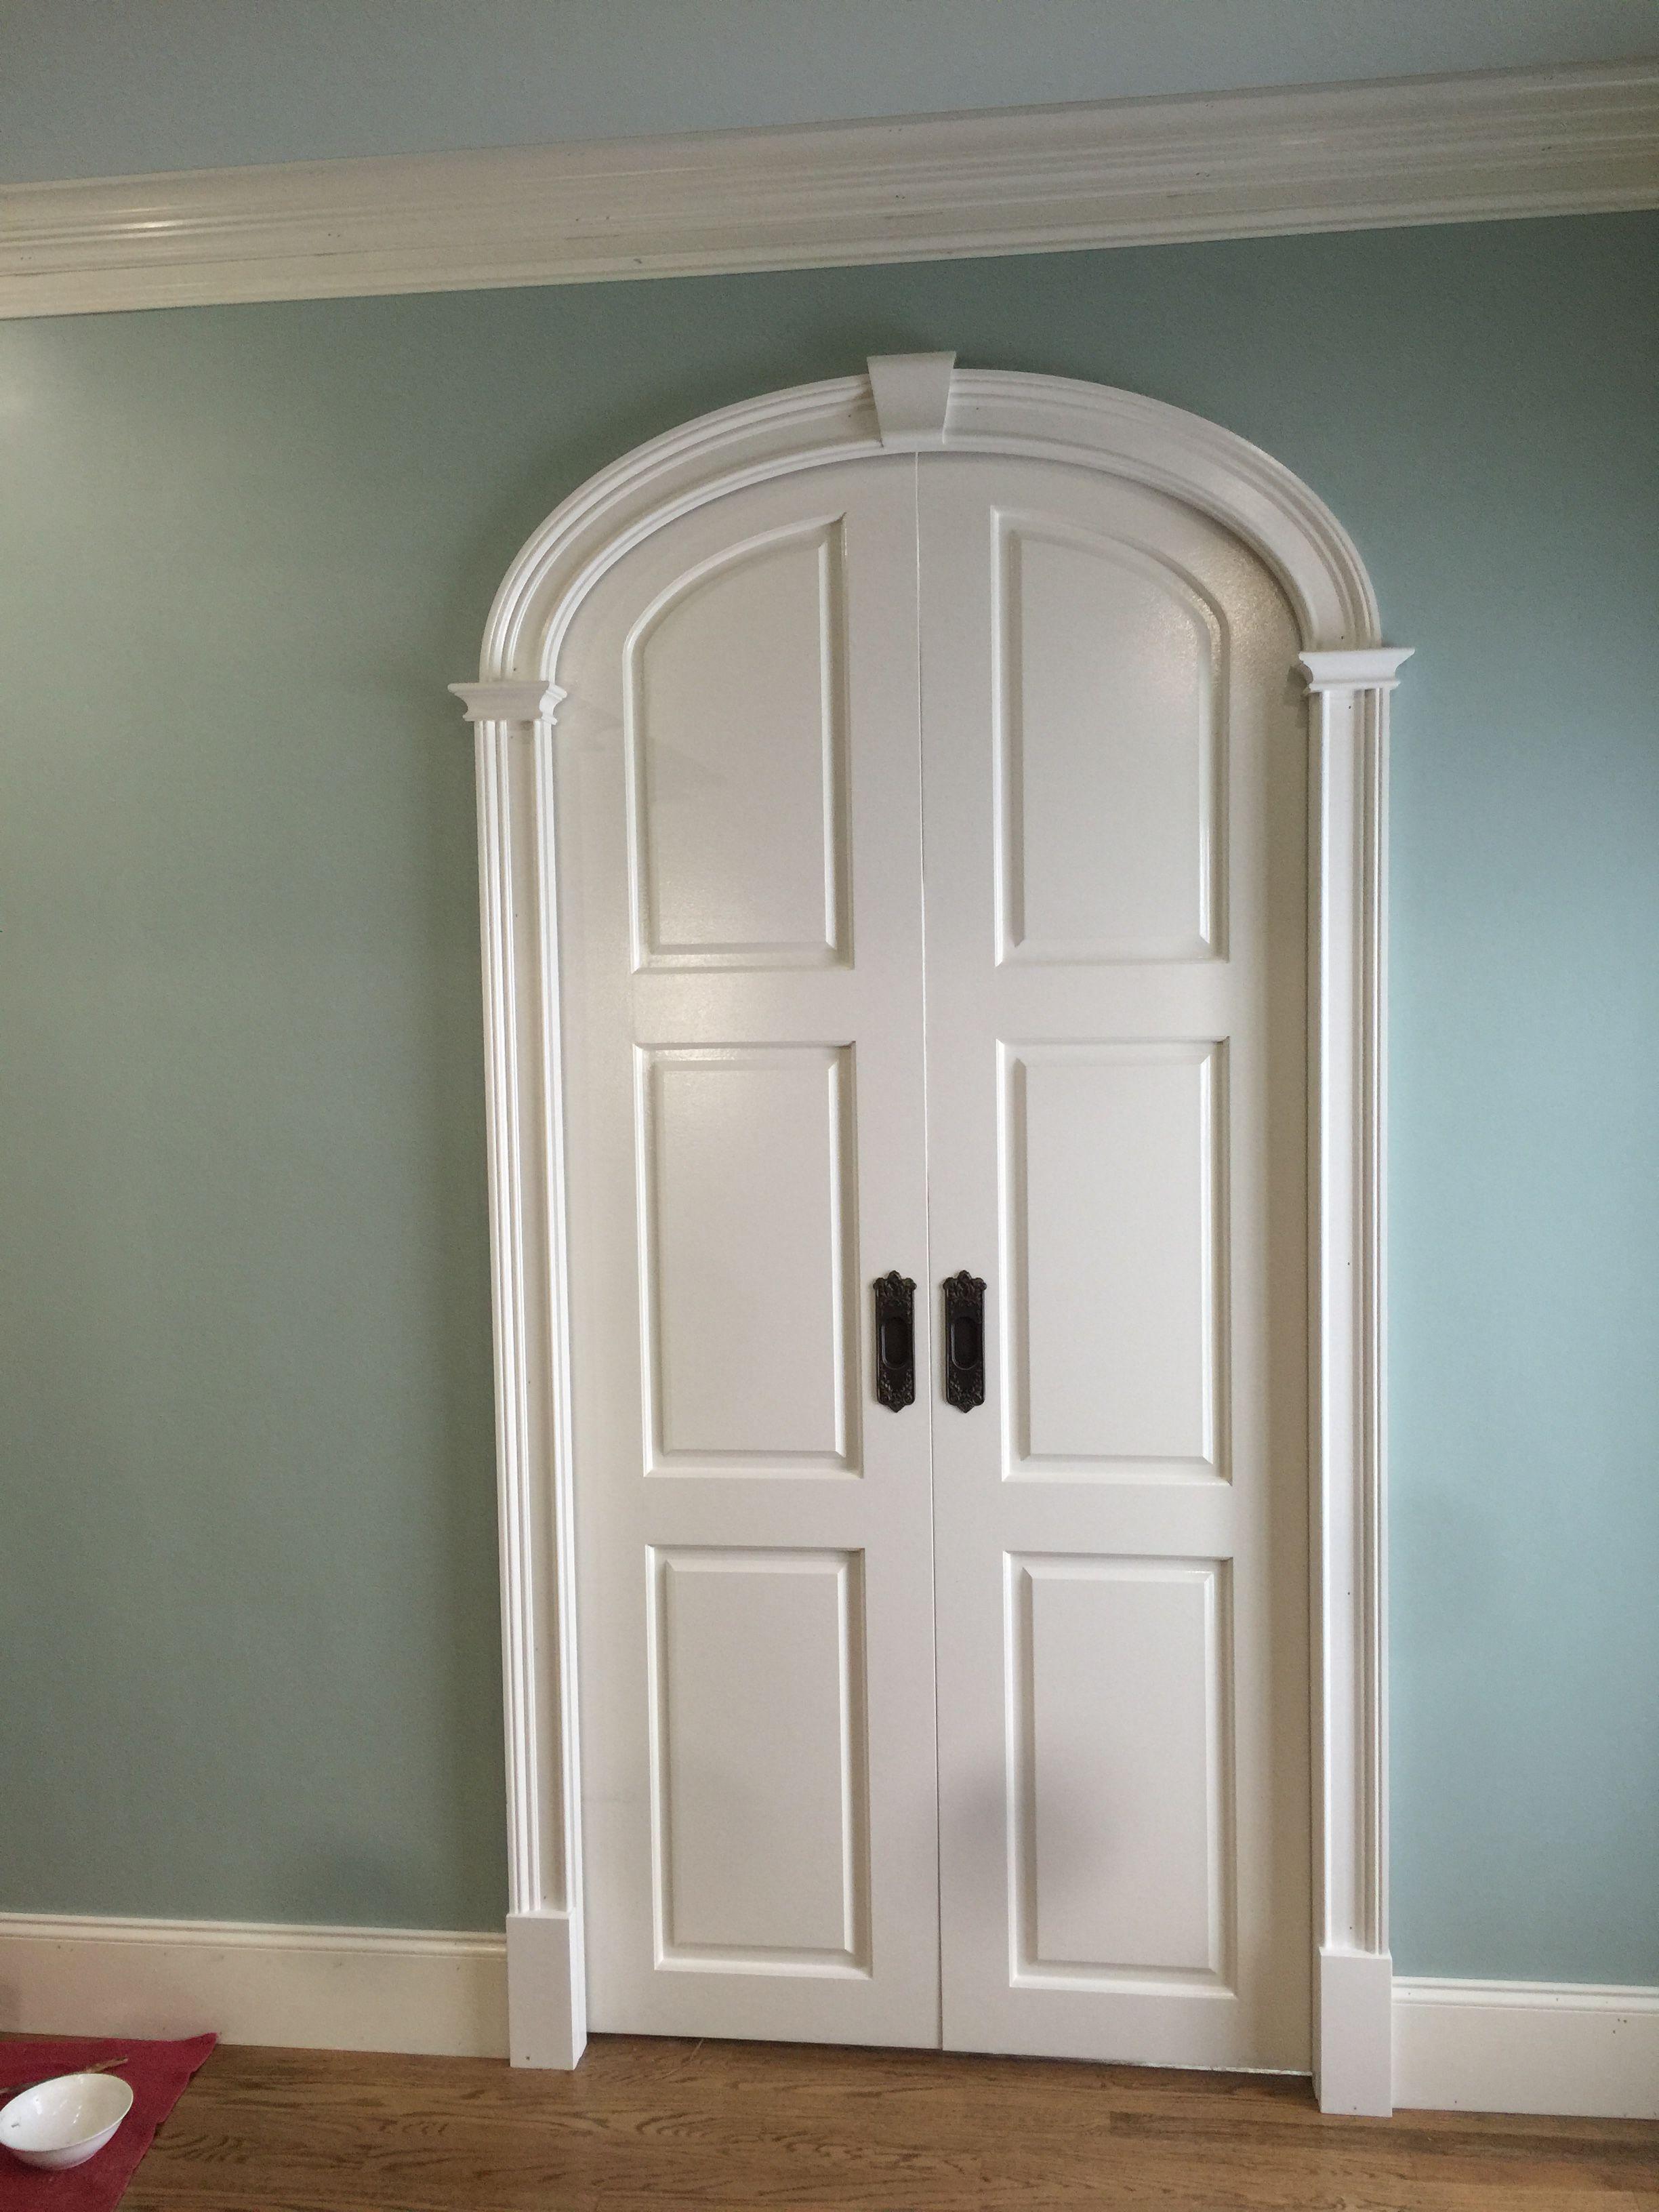 Arch Pocket Doors Prefab Kit Www Curvemakers Com